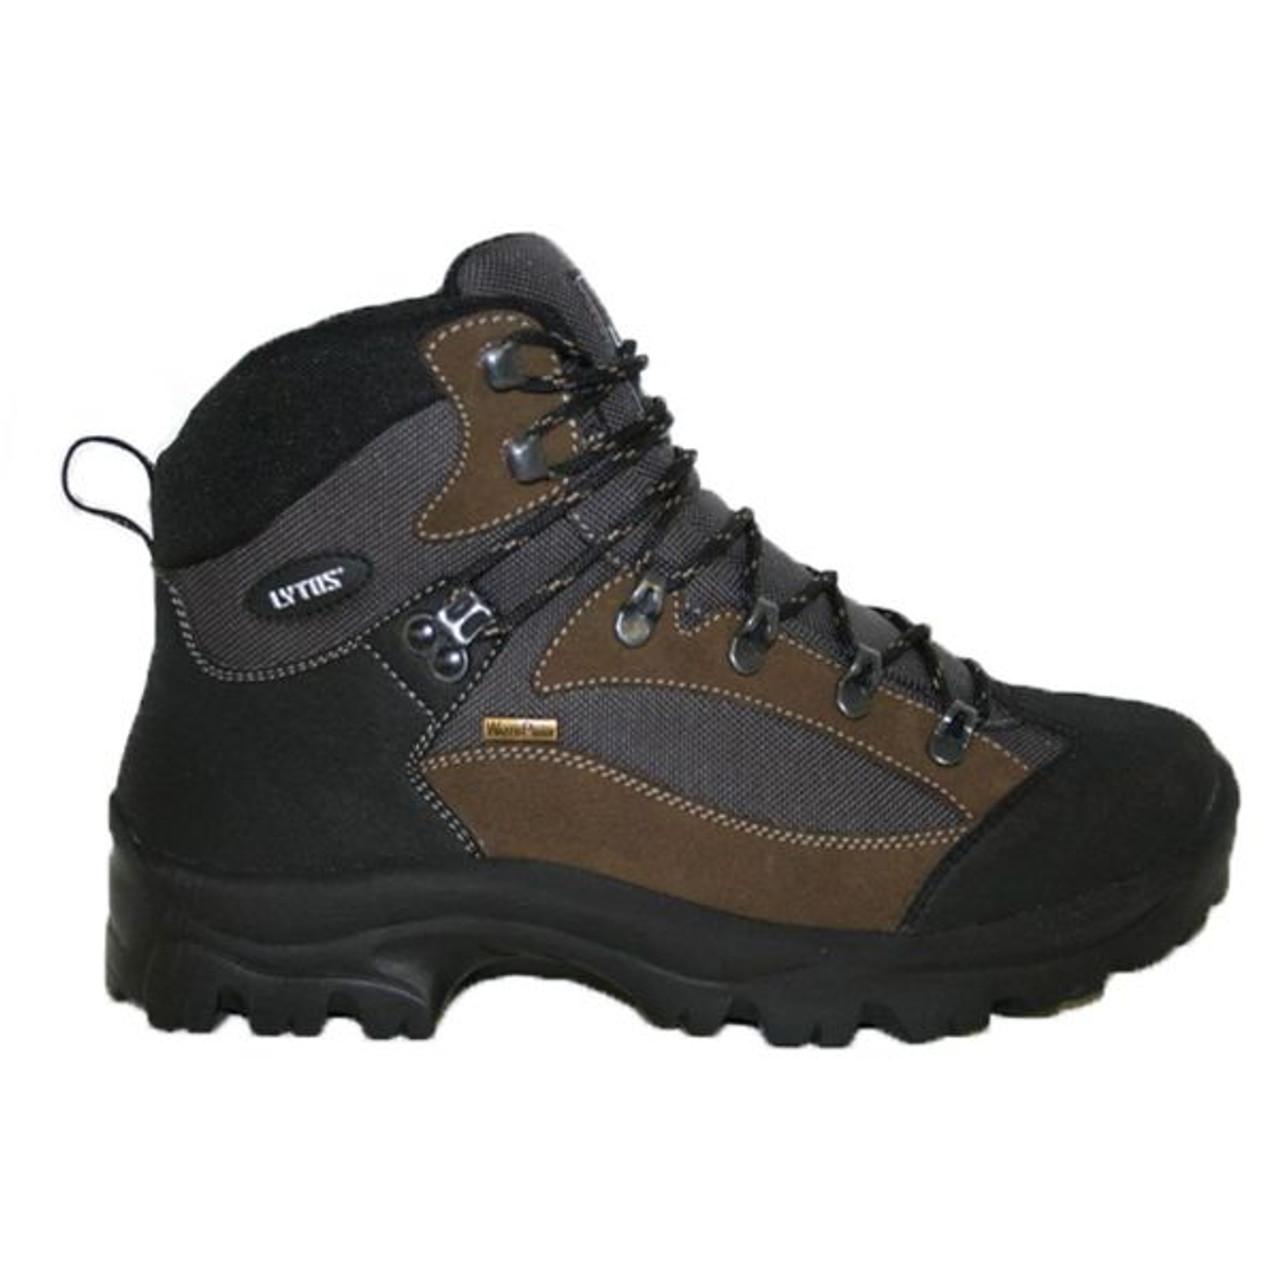 Lytos trekking shoes waterproof and